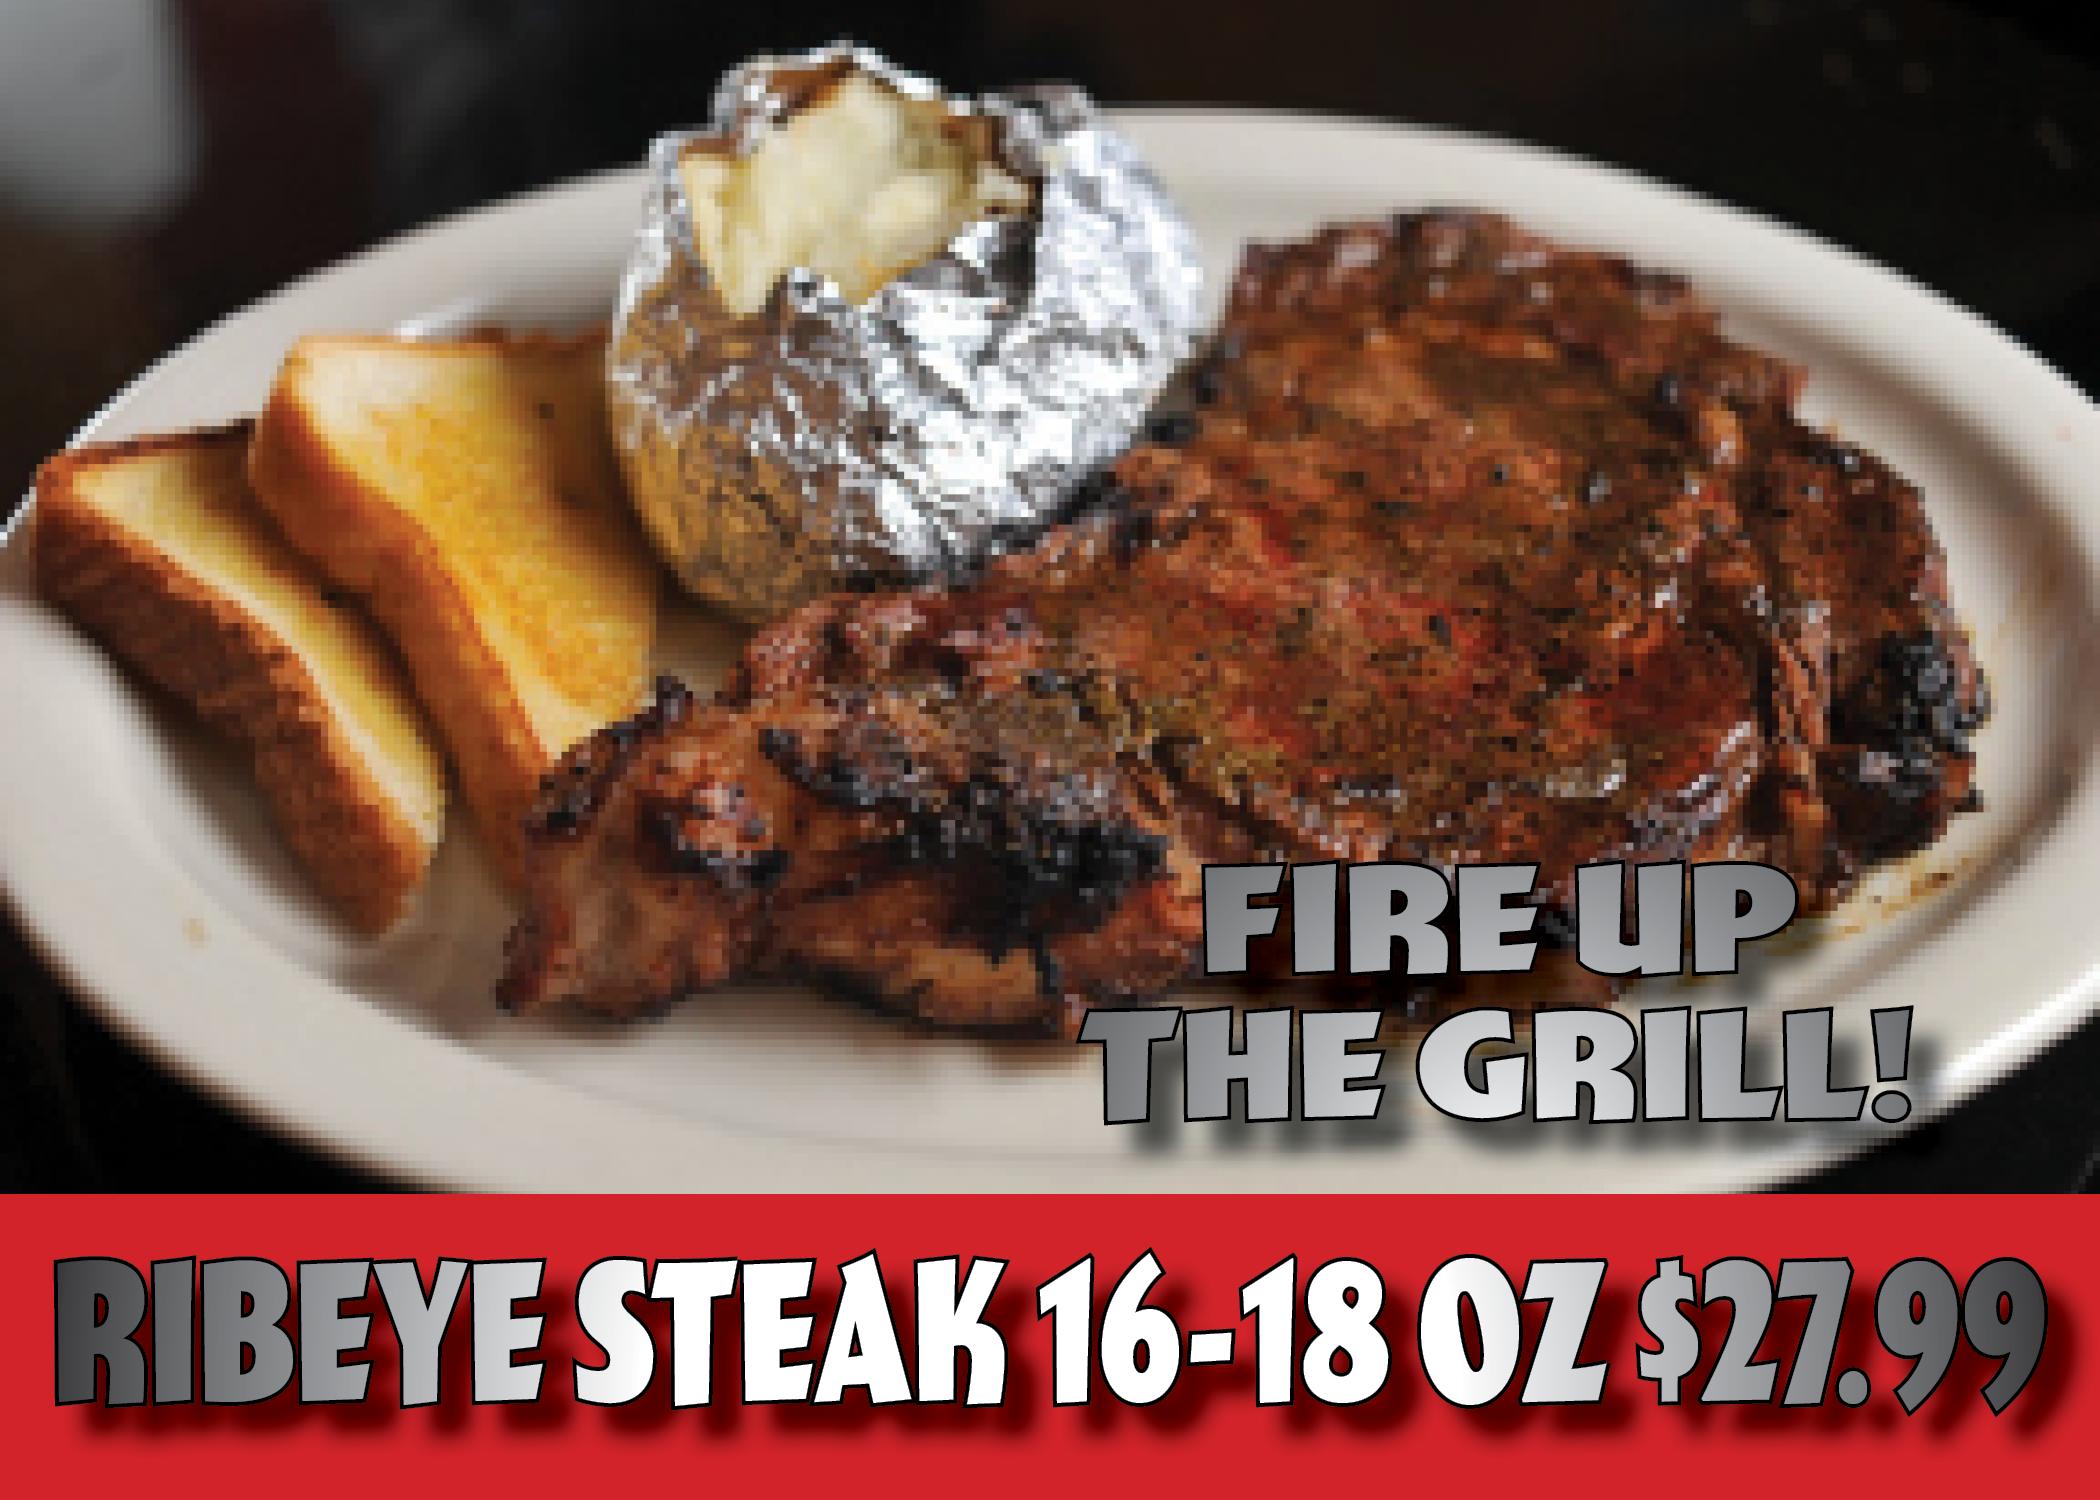 CC WEBSITE steak 7-6-19.png